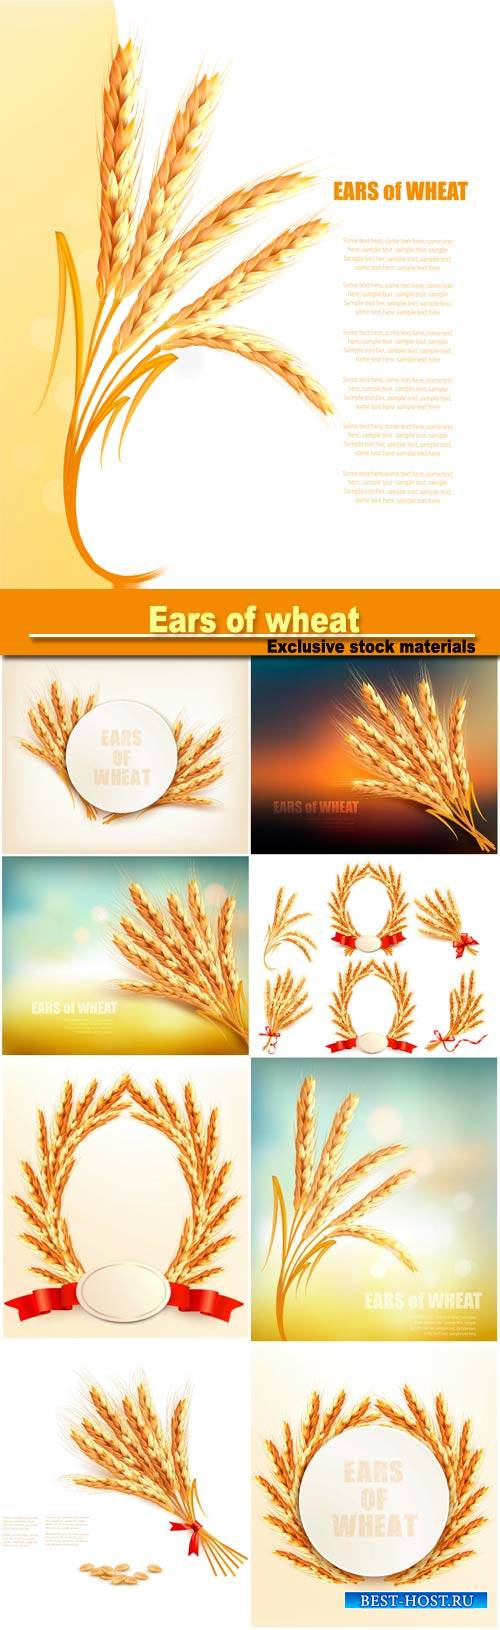 Ears of wheat, vector illustration